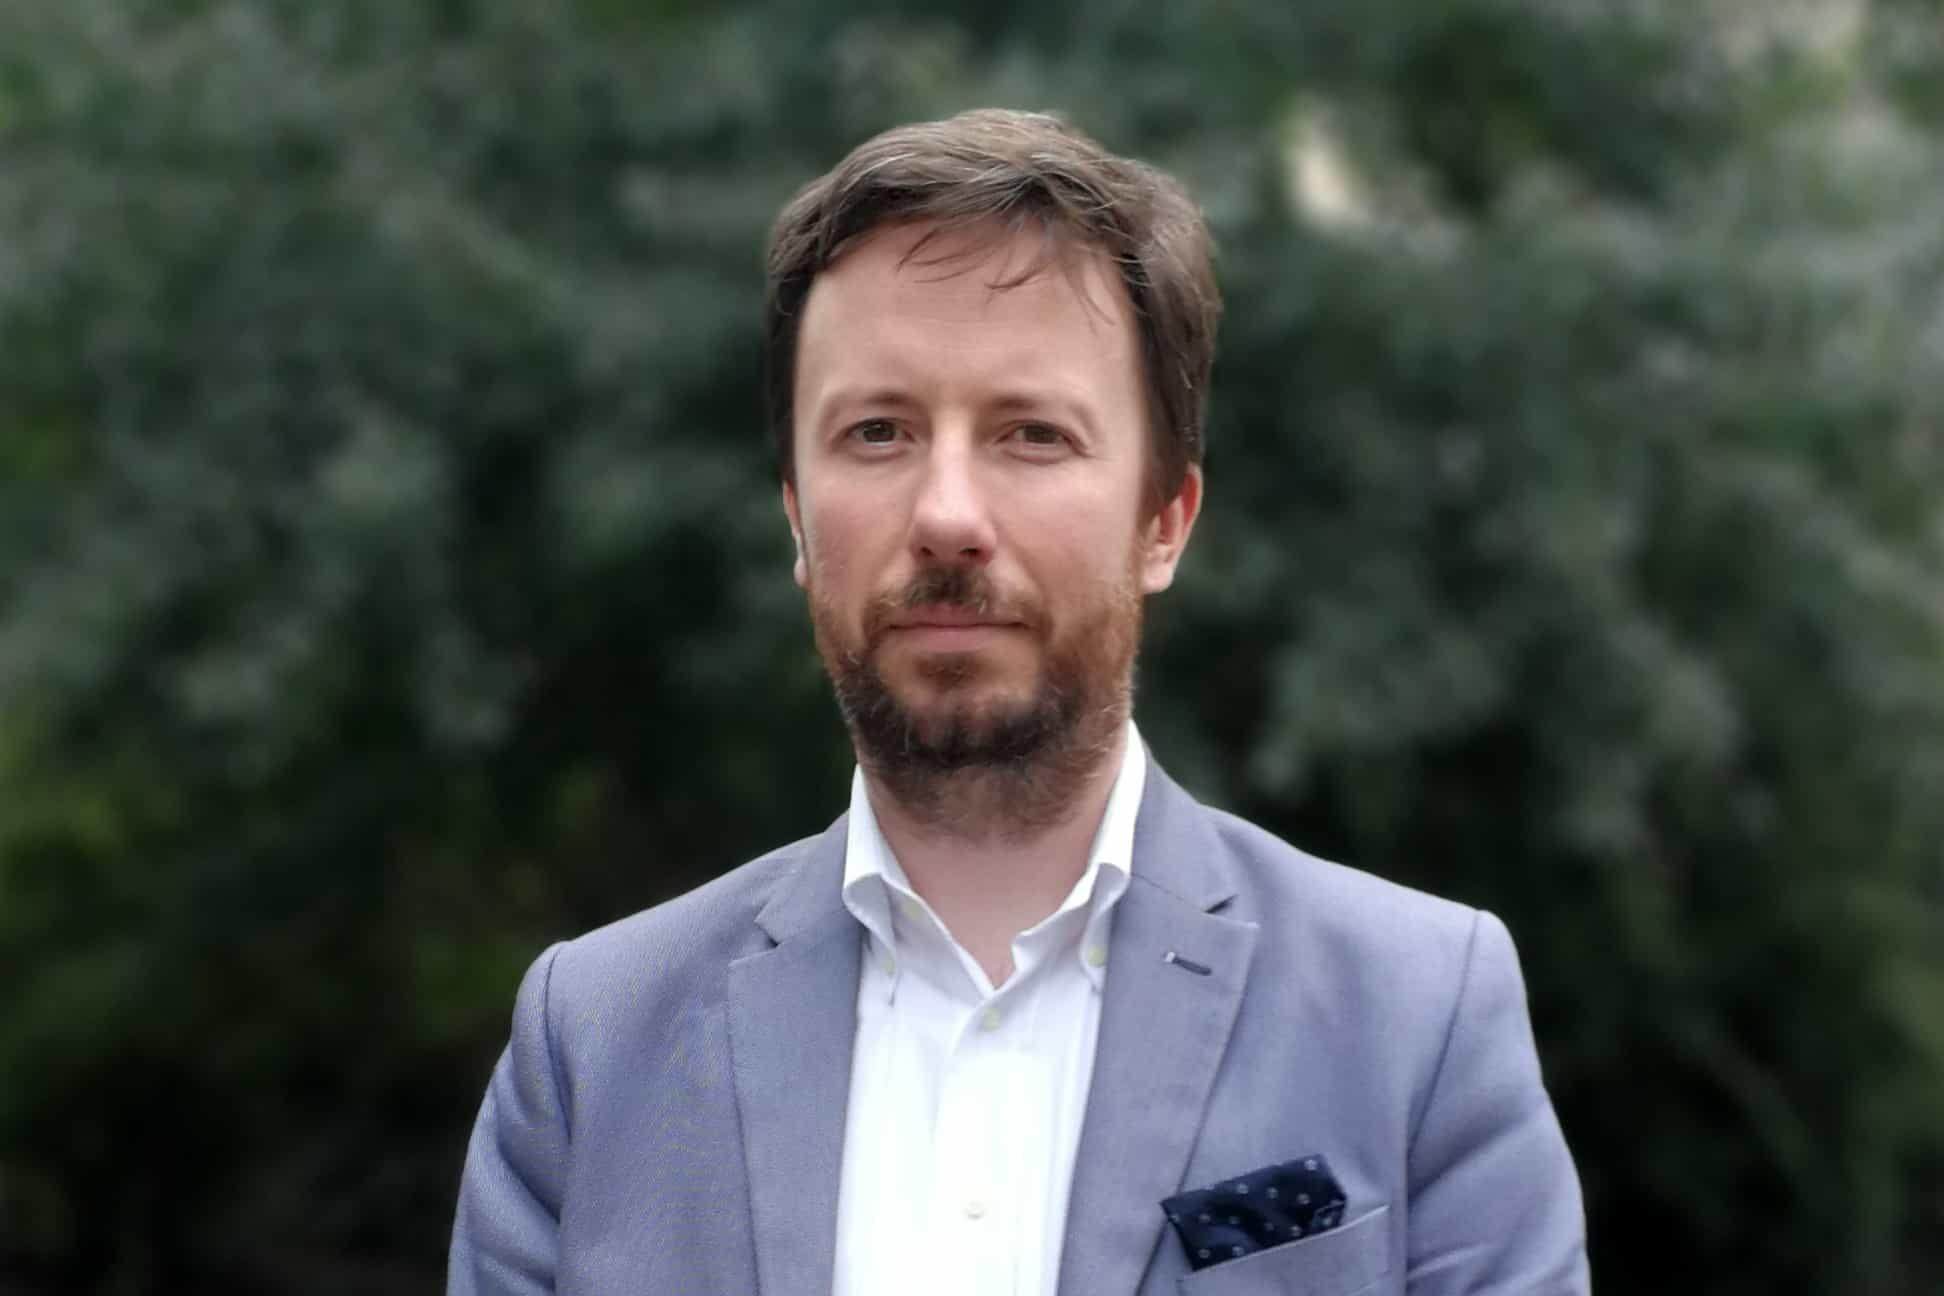 Filip Dutkowski